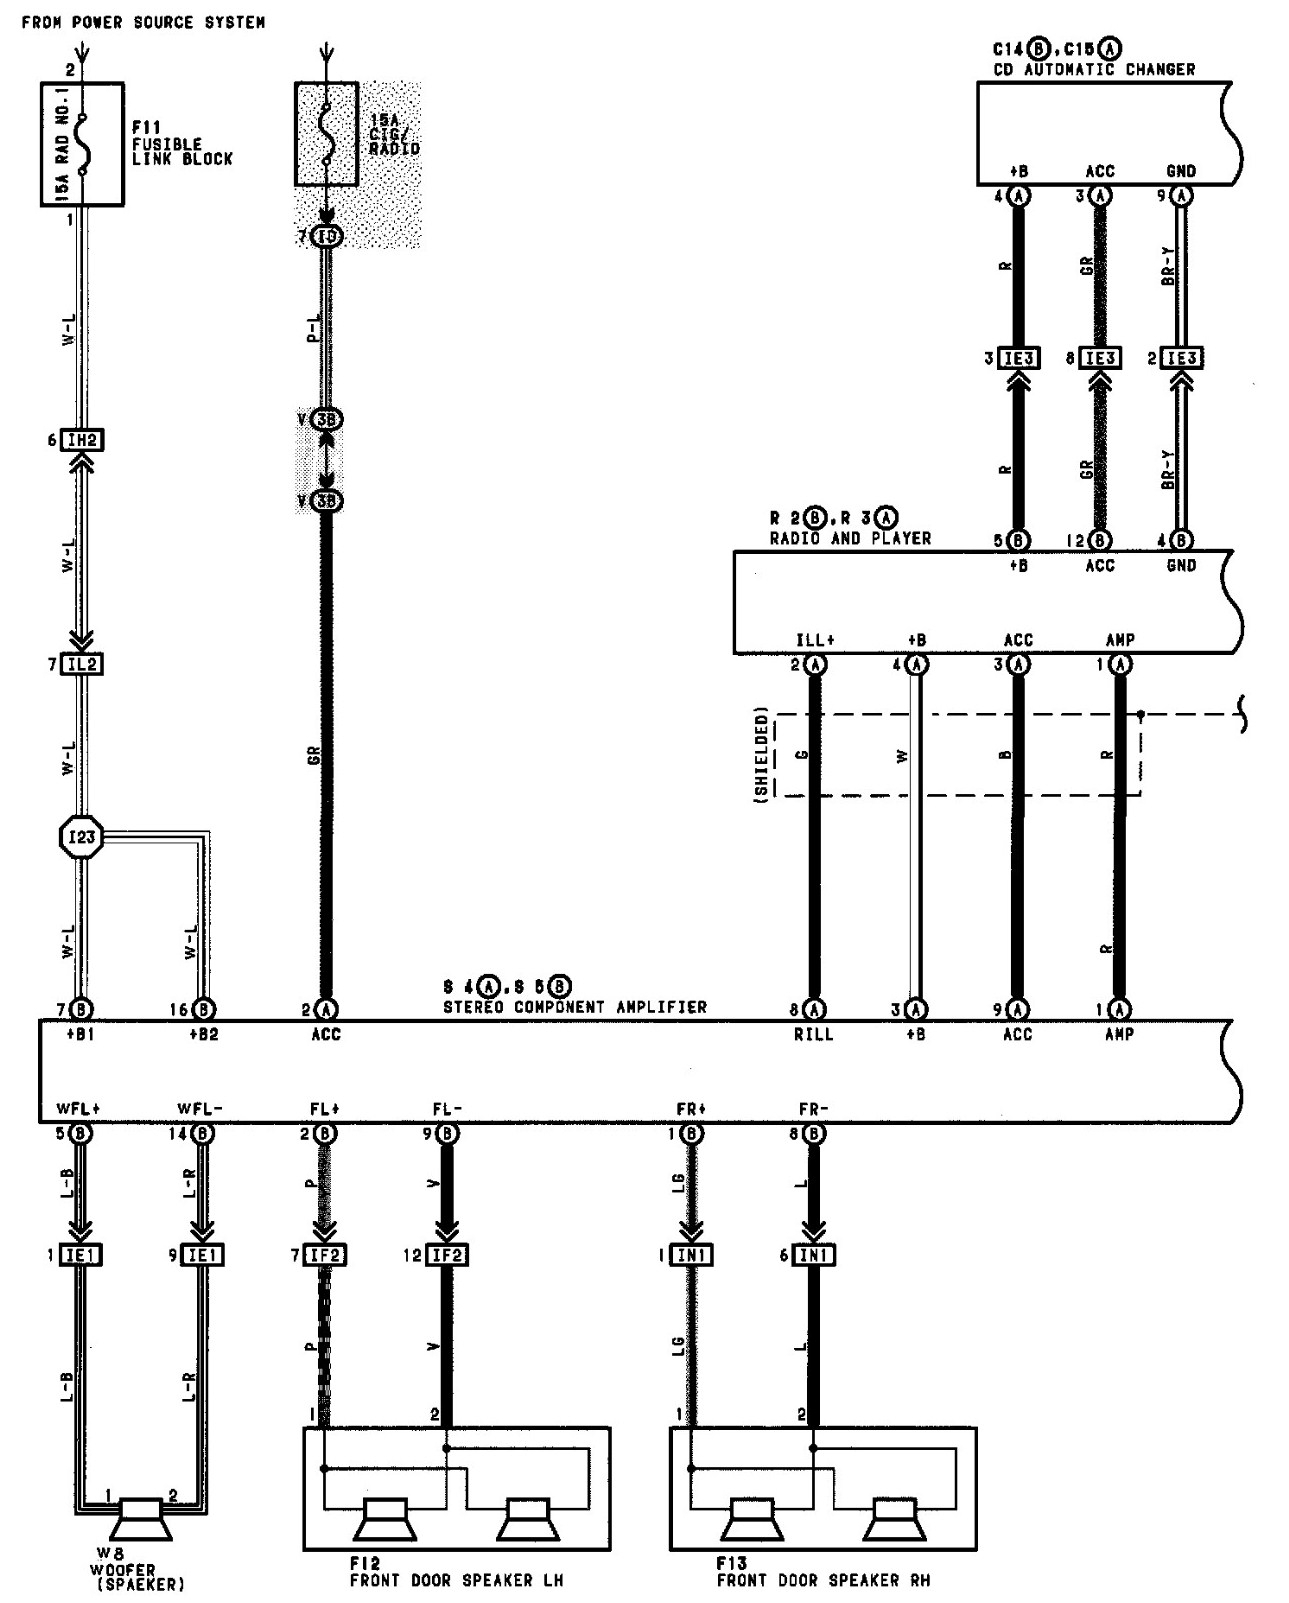 1997 toyota camry radio wiring diagram free wiring diagram